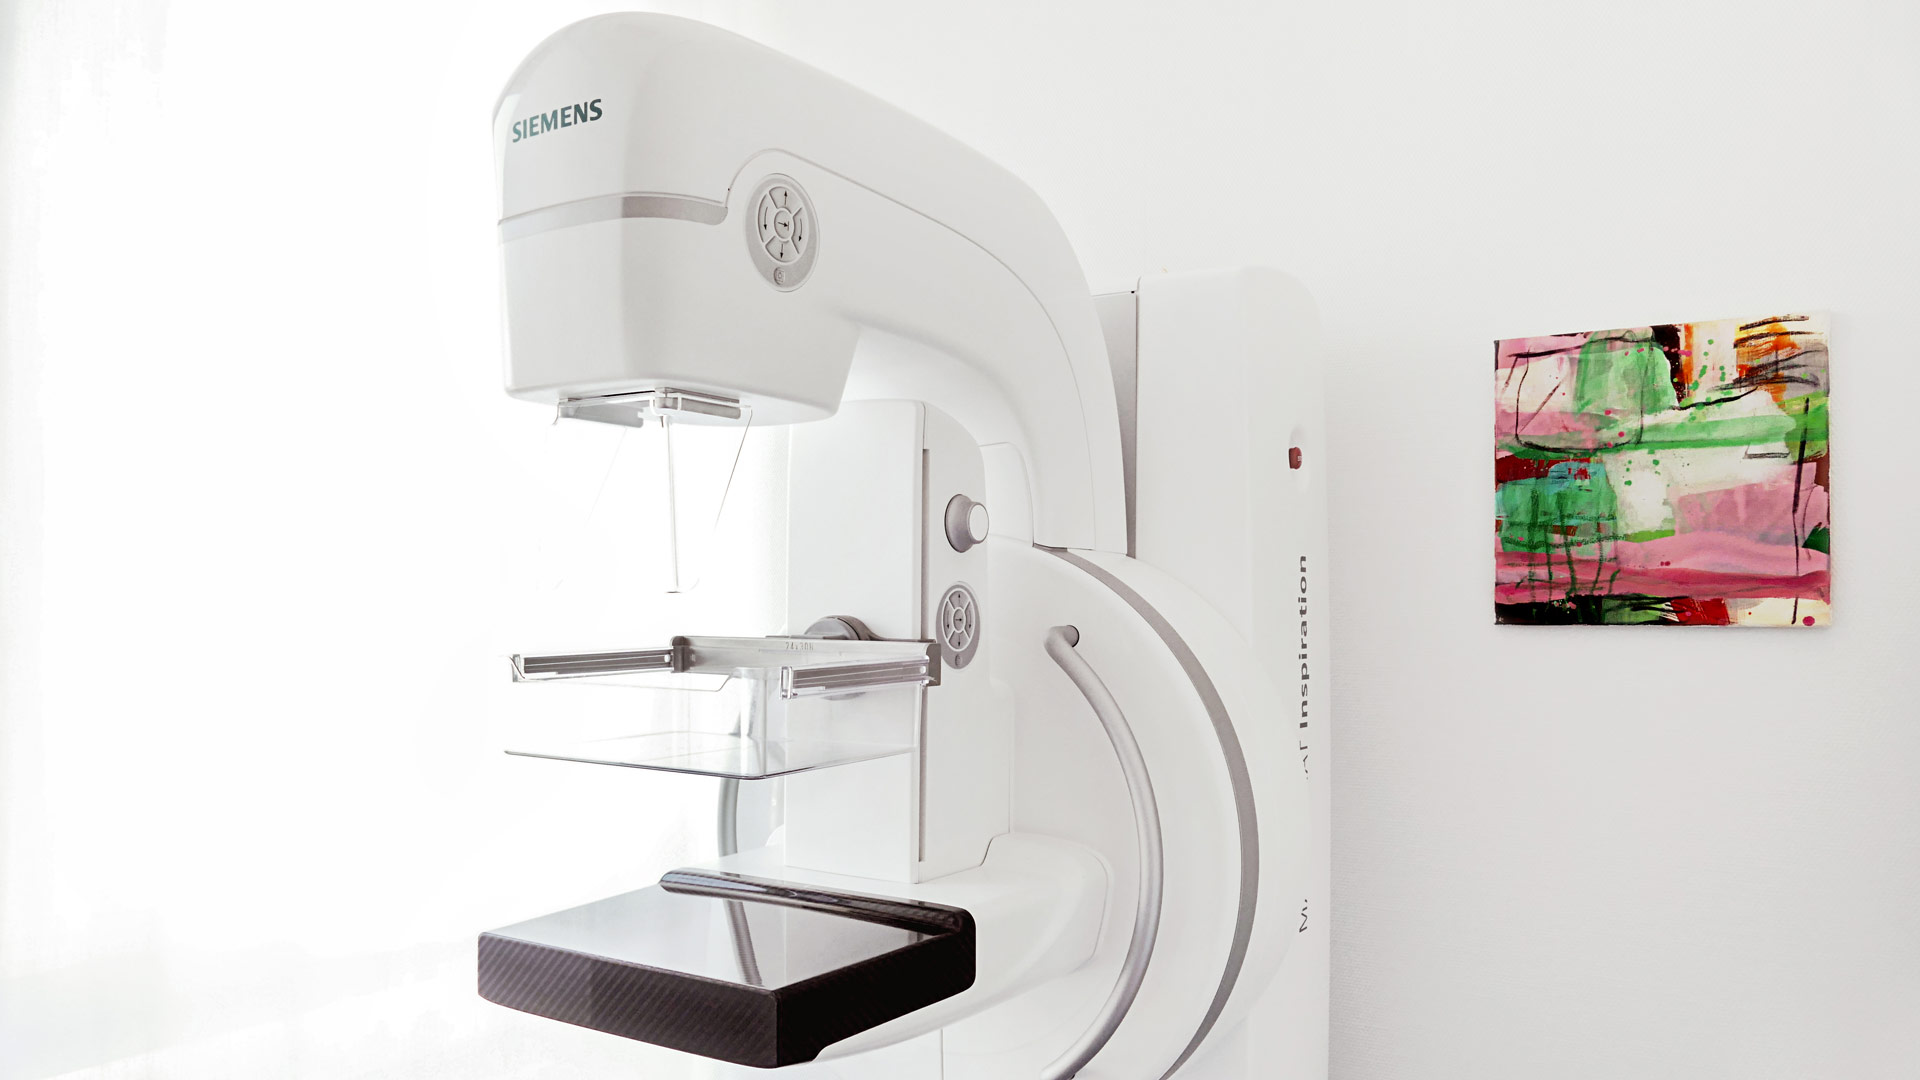 mammographie_1370030_1920